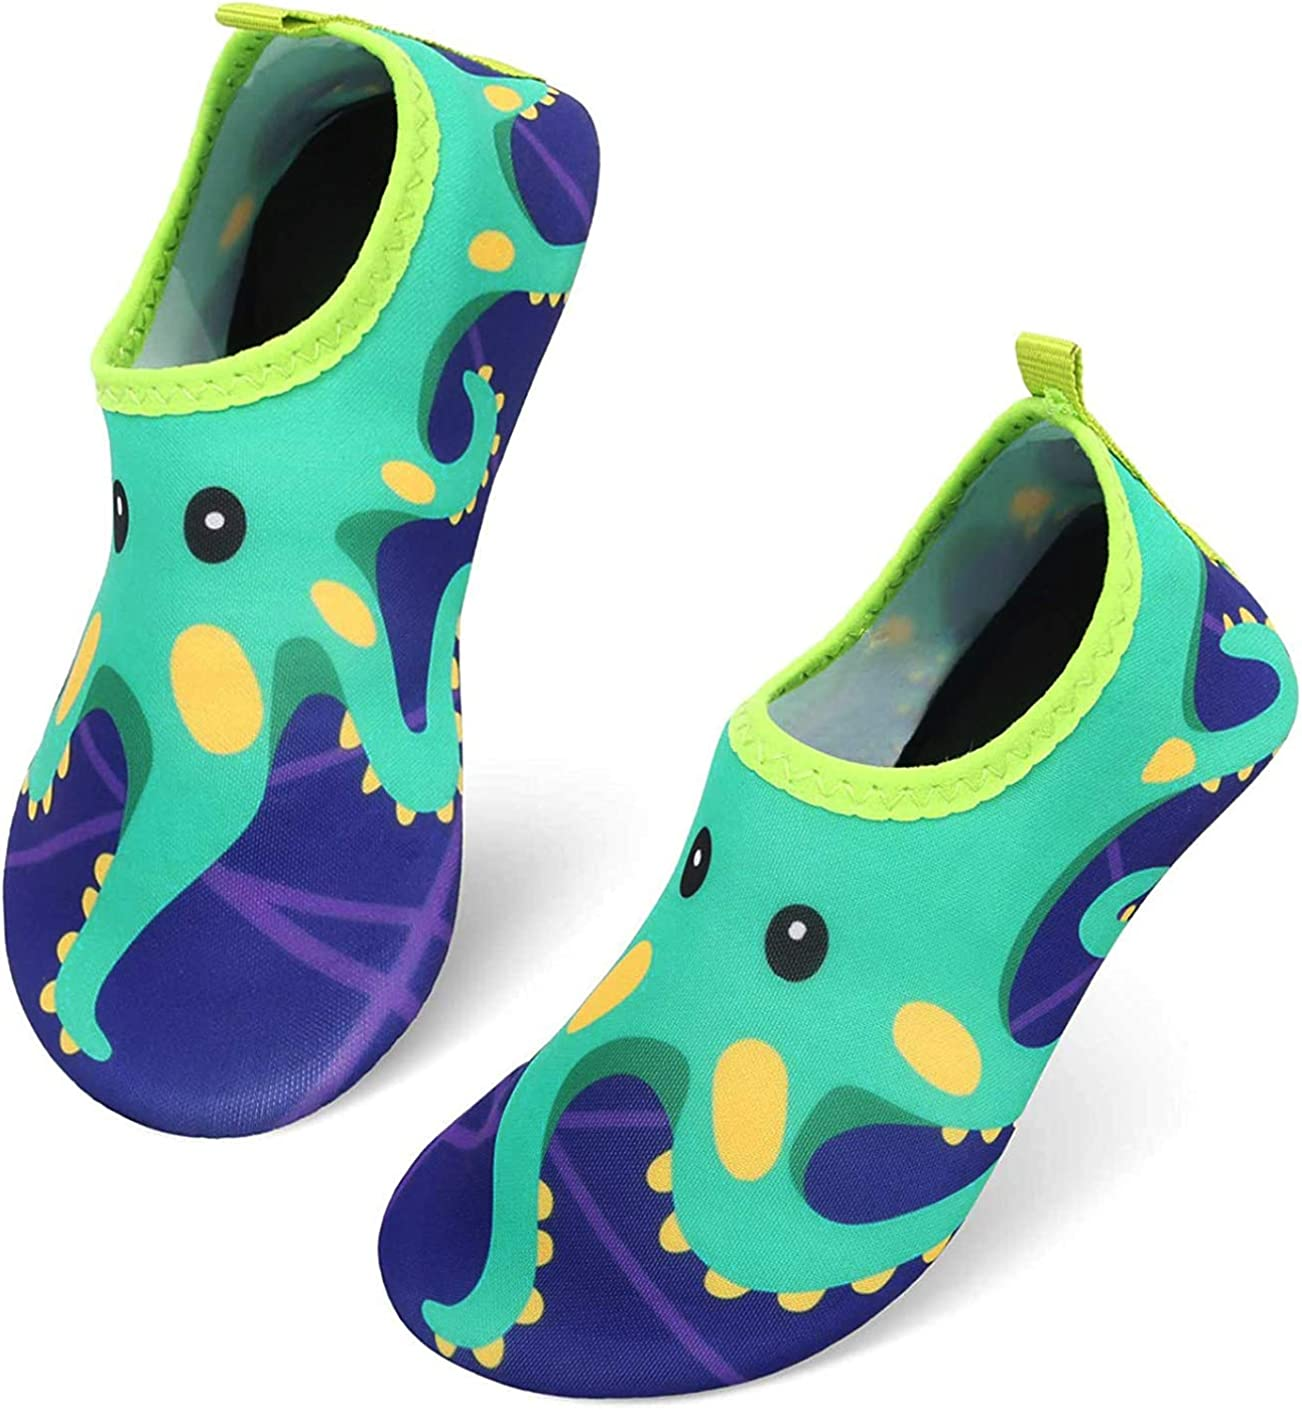 PIZOFF Toddler Kids Water Shoes Non-Slip Quick Dry Water Skin Barefoot Aqua Socks for Beach Swim Walking